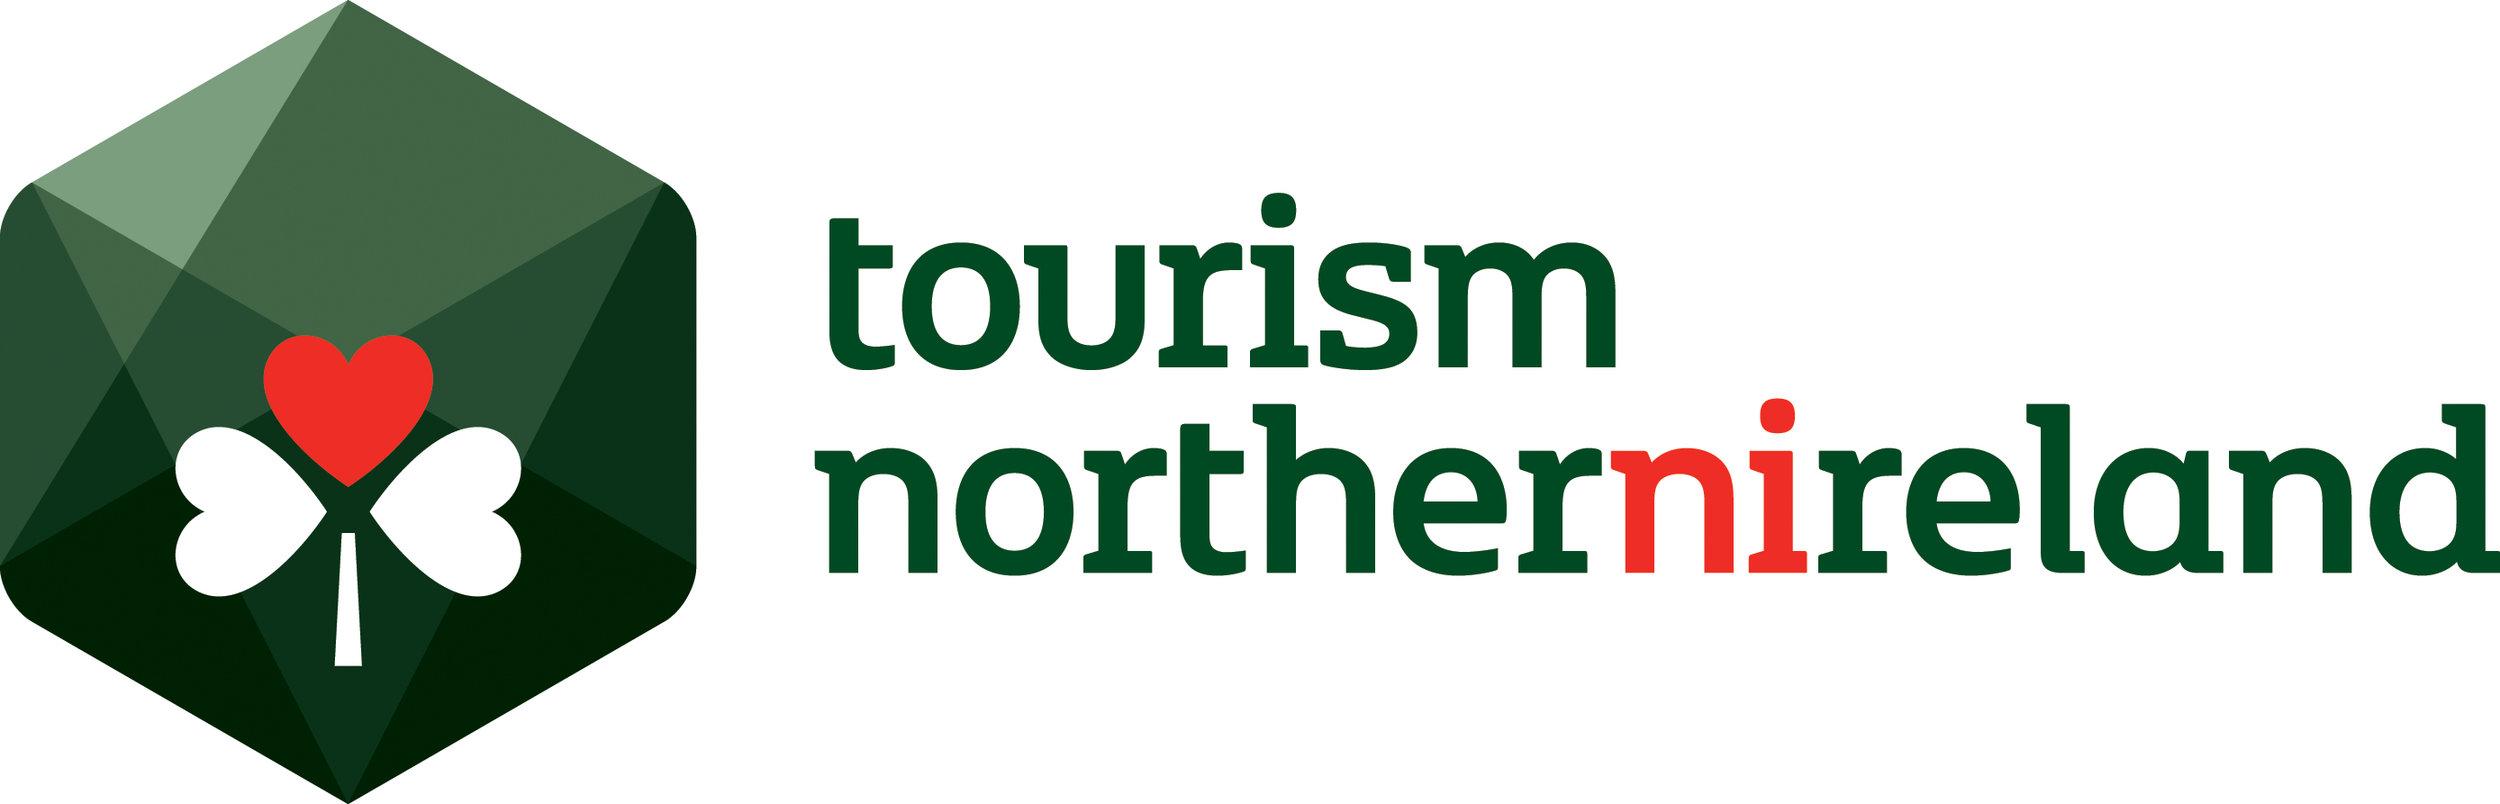 Tourism Northern Ireland Logo-rgb (002).jpg